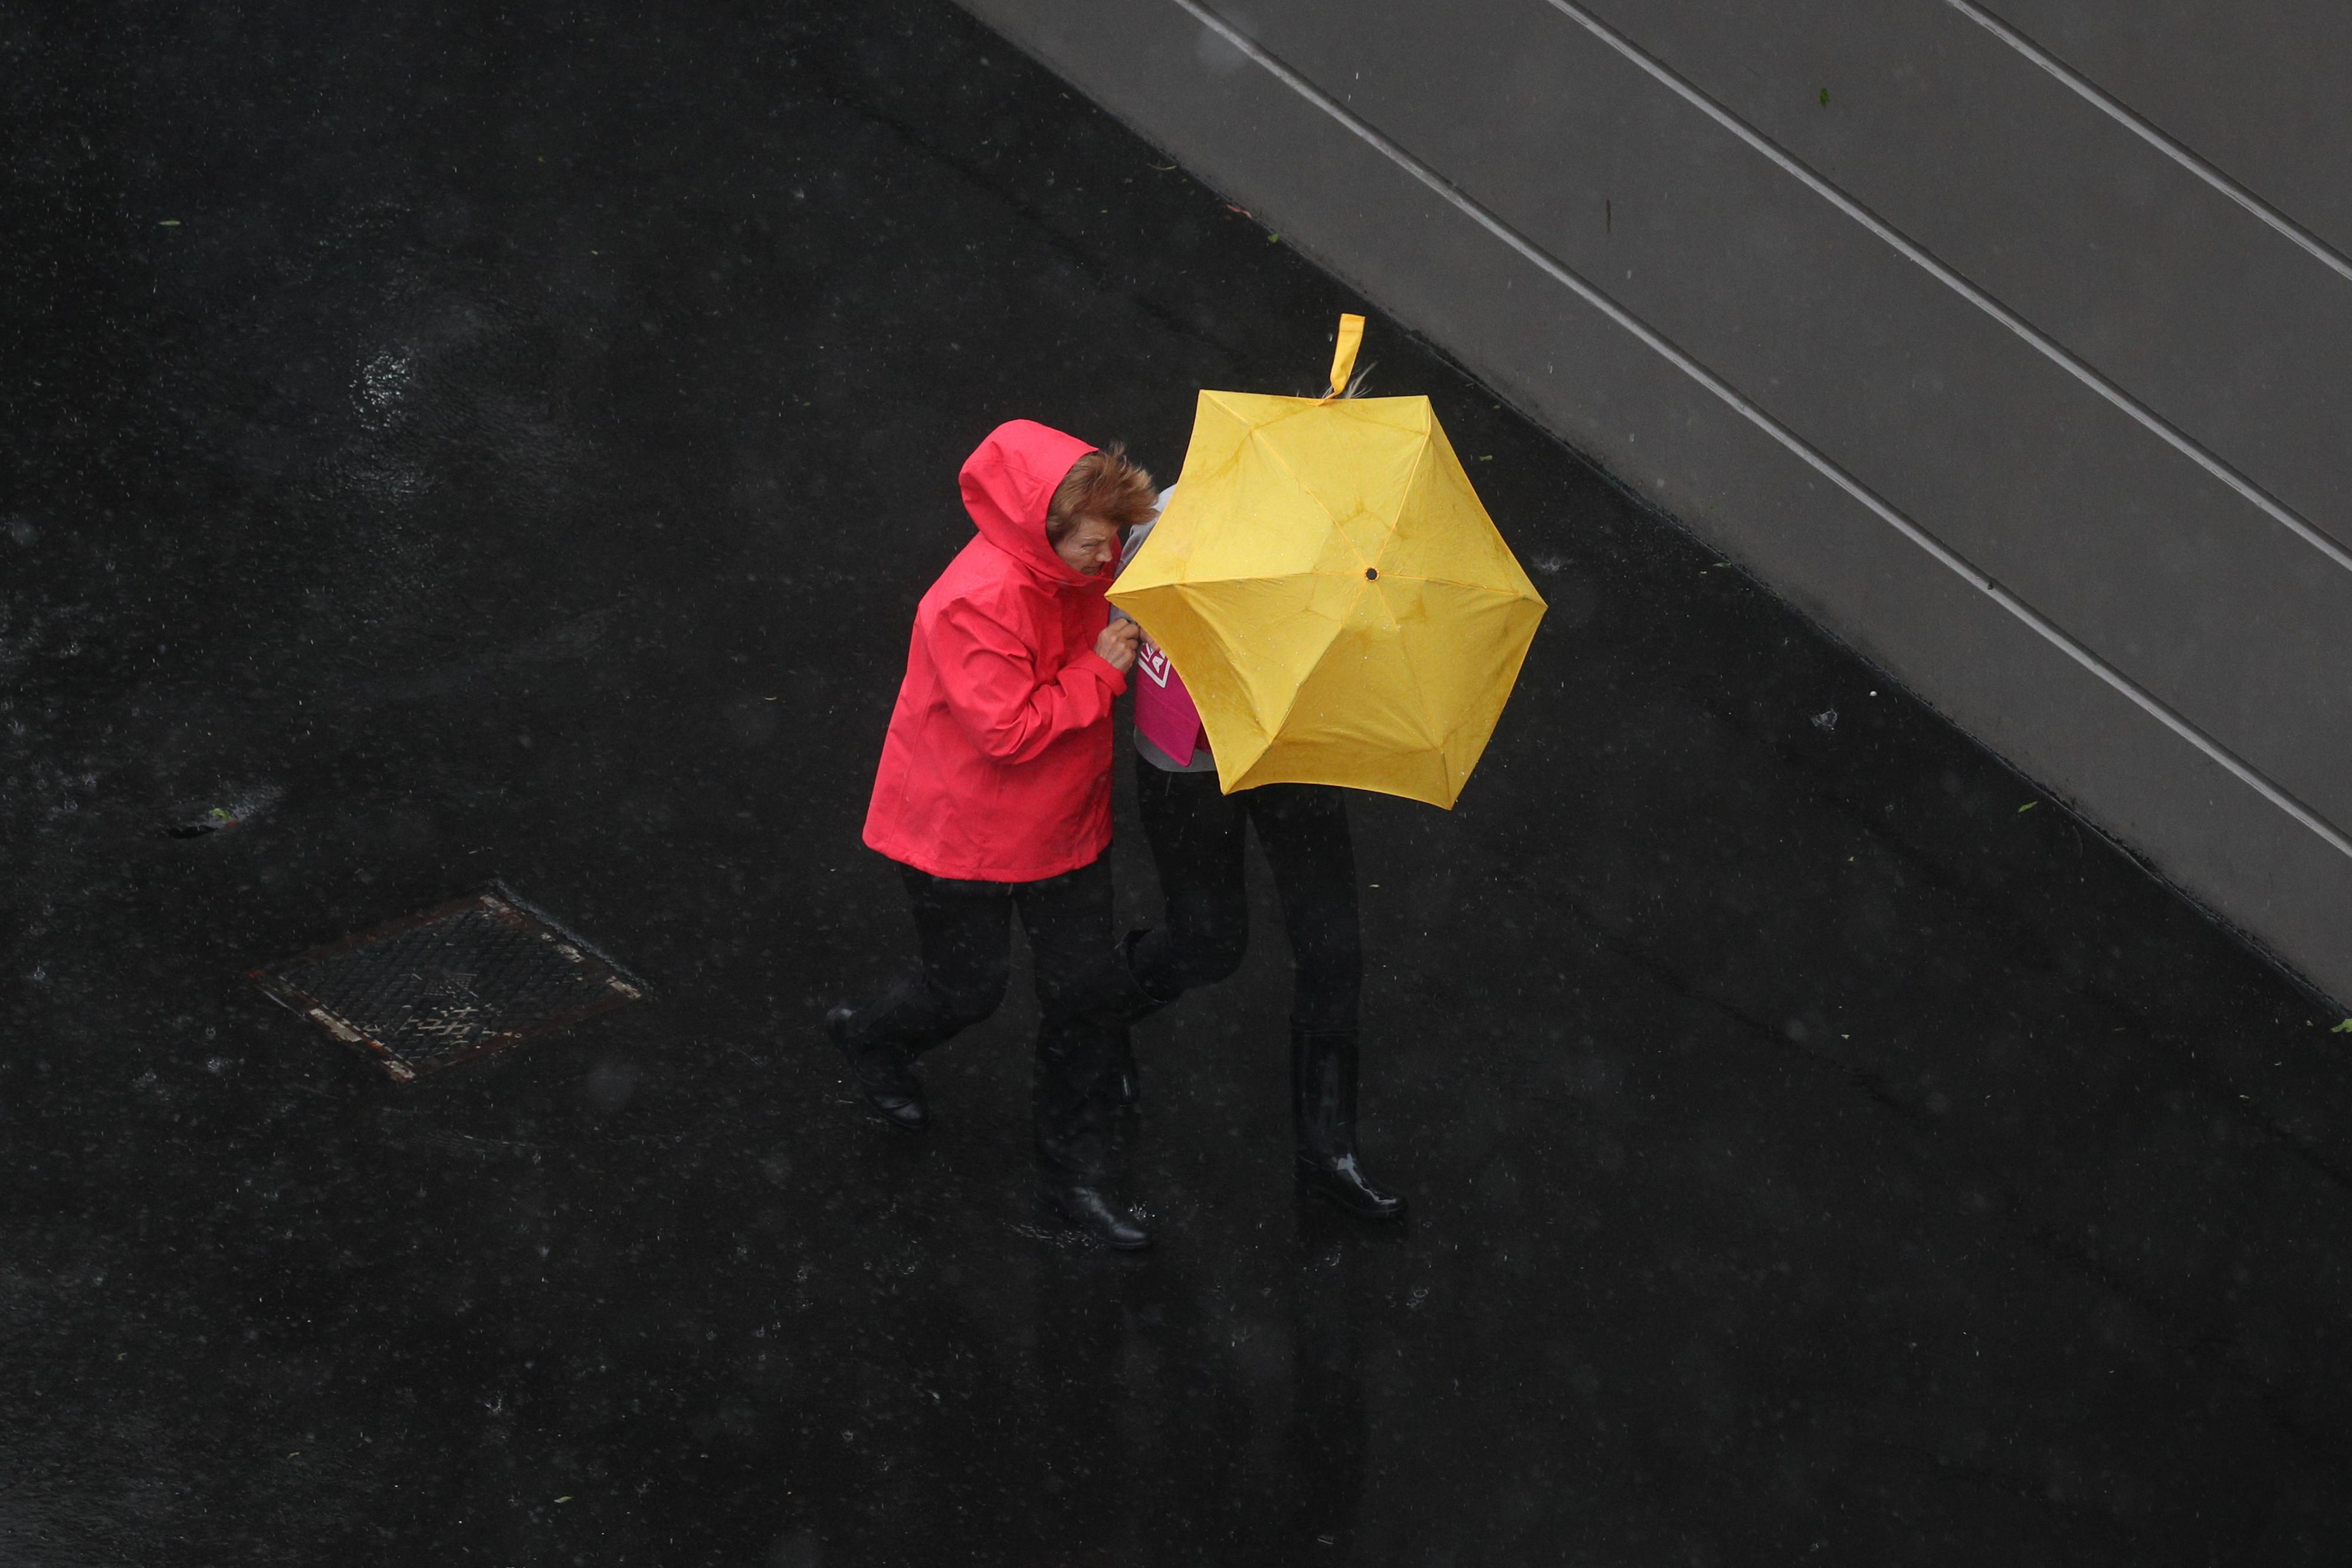 Pedestrians brave strong wind and rain in Sydney, New South Wales, Australia, February 9, 2020.  REUTERS/Loren Elliott - RC2PWE9FLNQ8